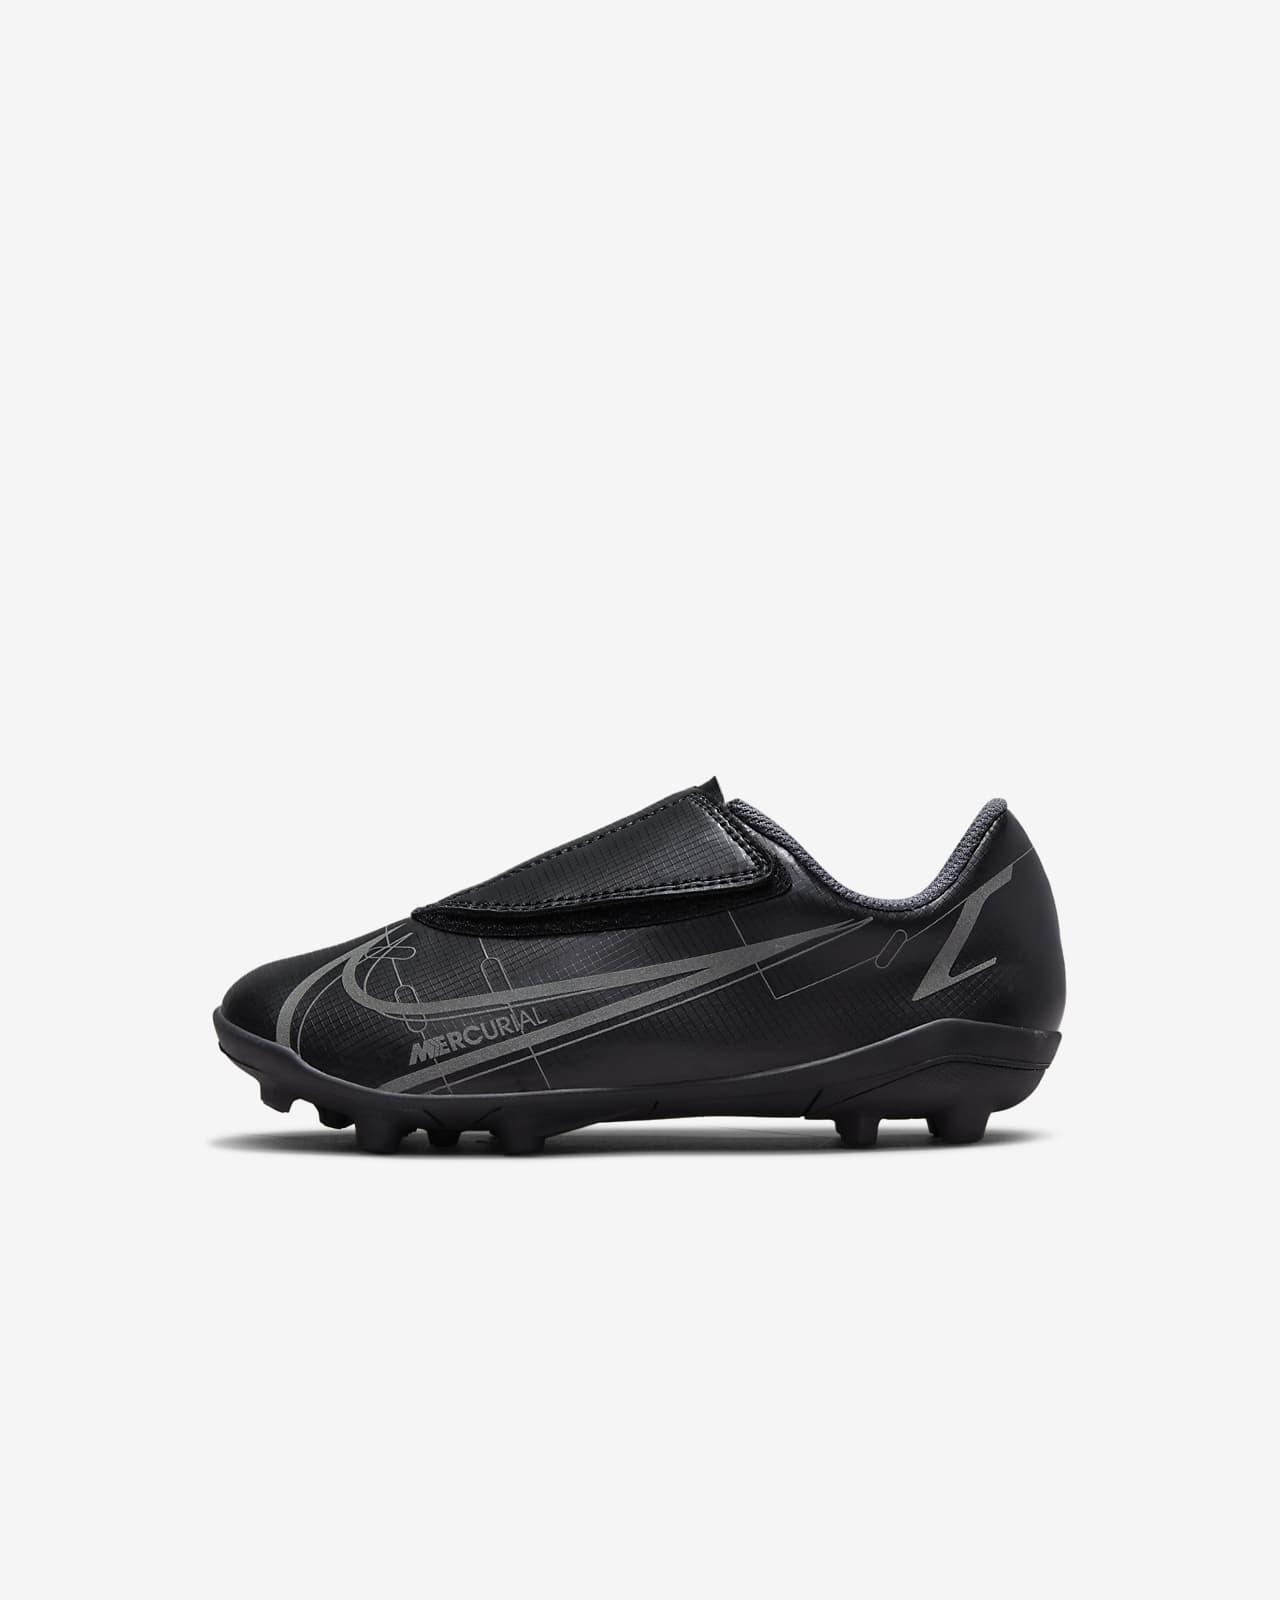 Nike Jr. Mercurial Vapor 14 Club MG Younger Kids' Multi-Ground Football Boot